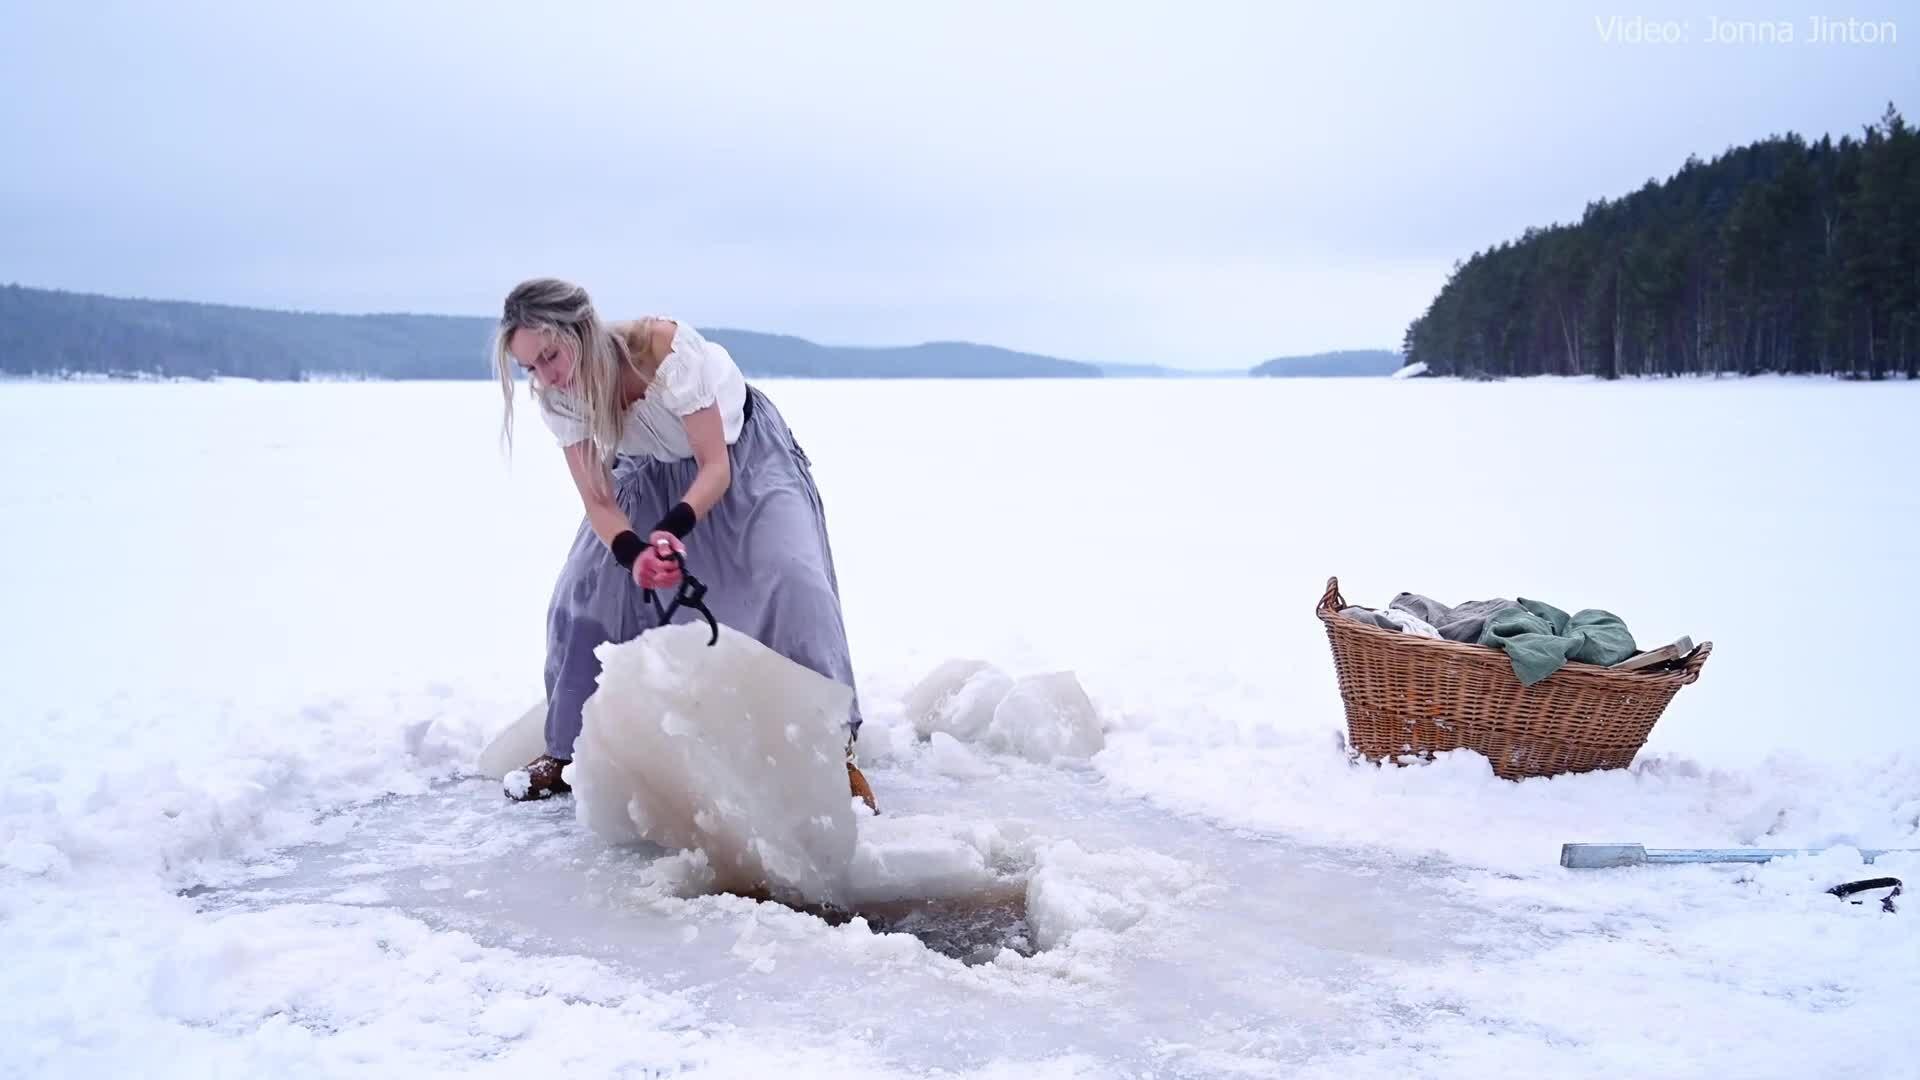 Giặt quần áo giữa hồ băng Bắc Âu